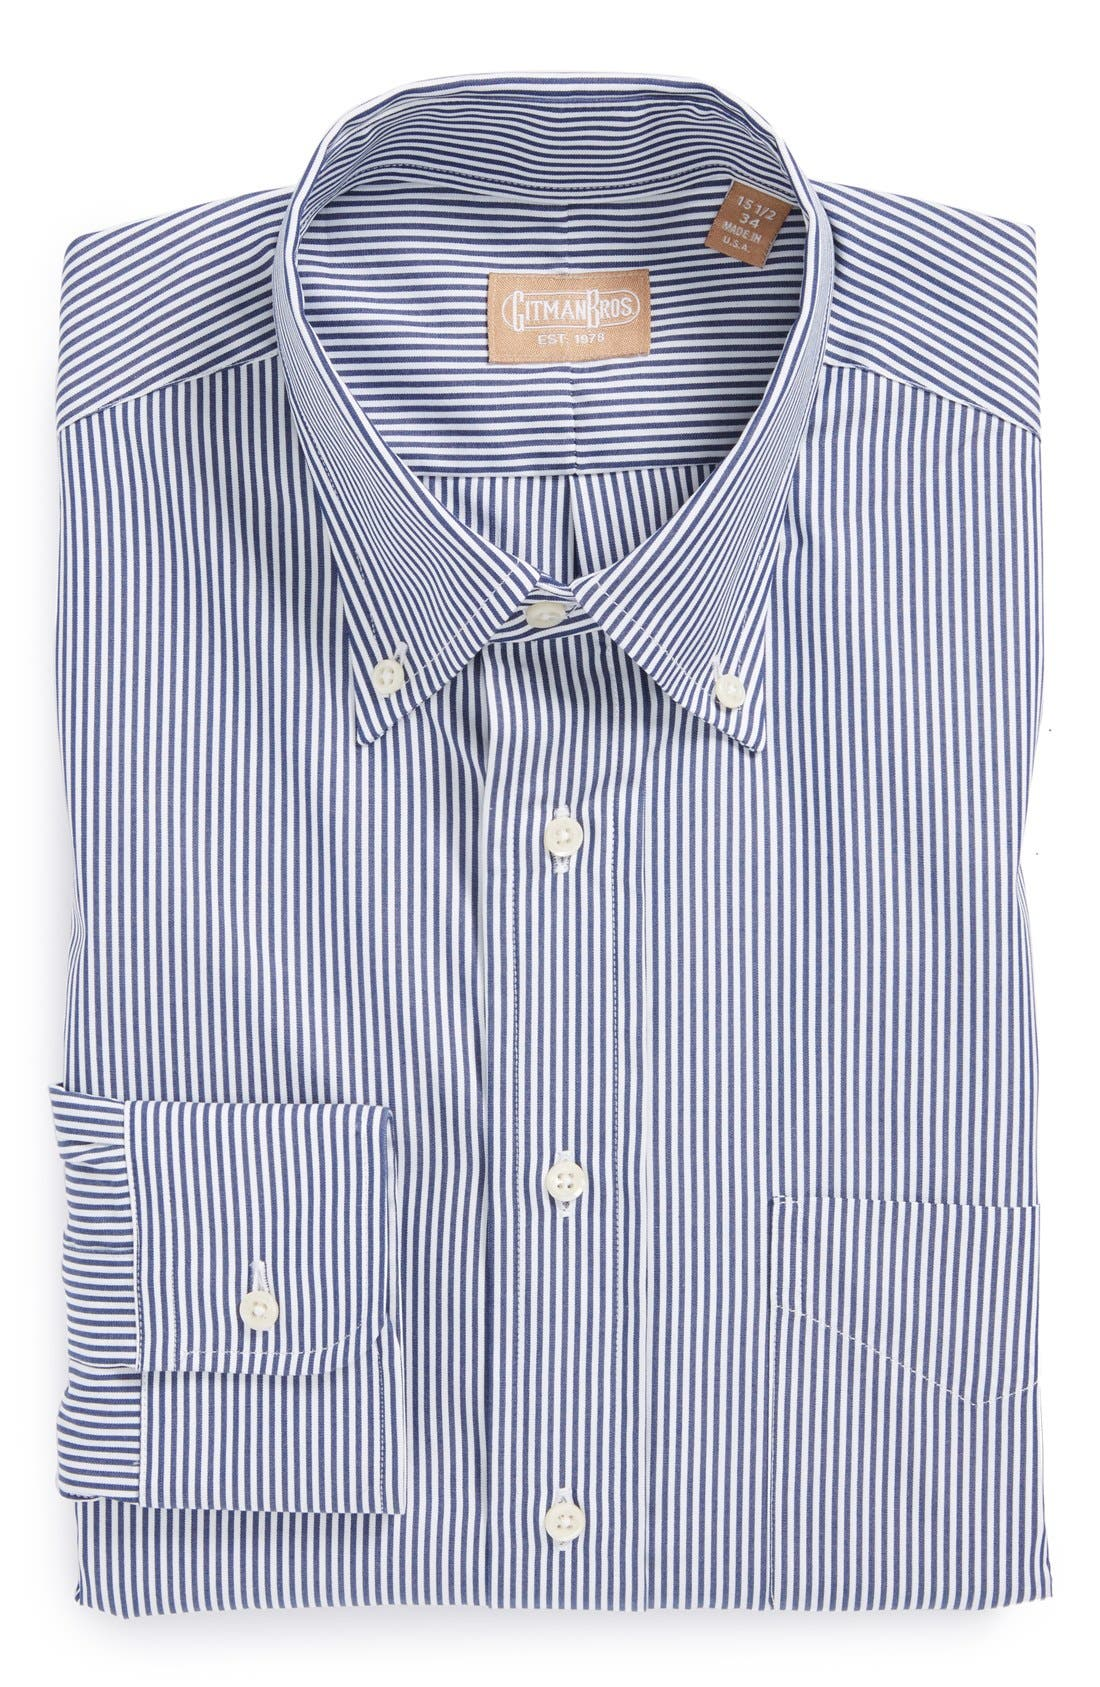 Regular Fit Bengal Stripe Cotton Broadcloth Button Down Dress Shirt,                             Main thumbnail 1, color,                             NAVY